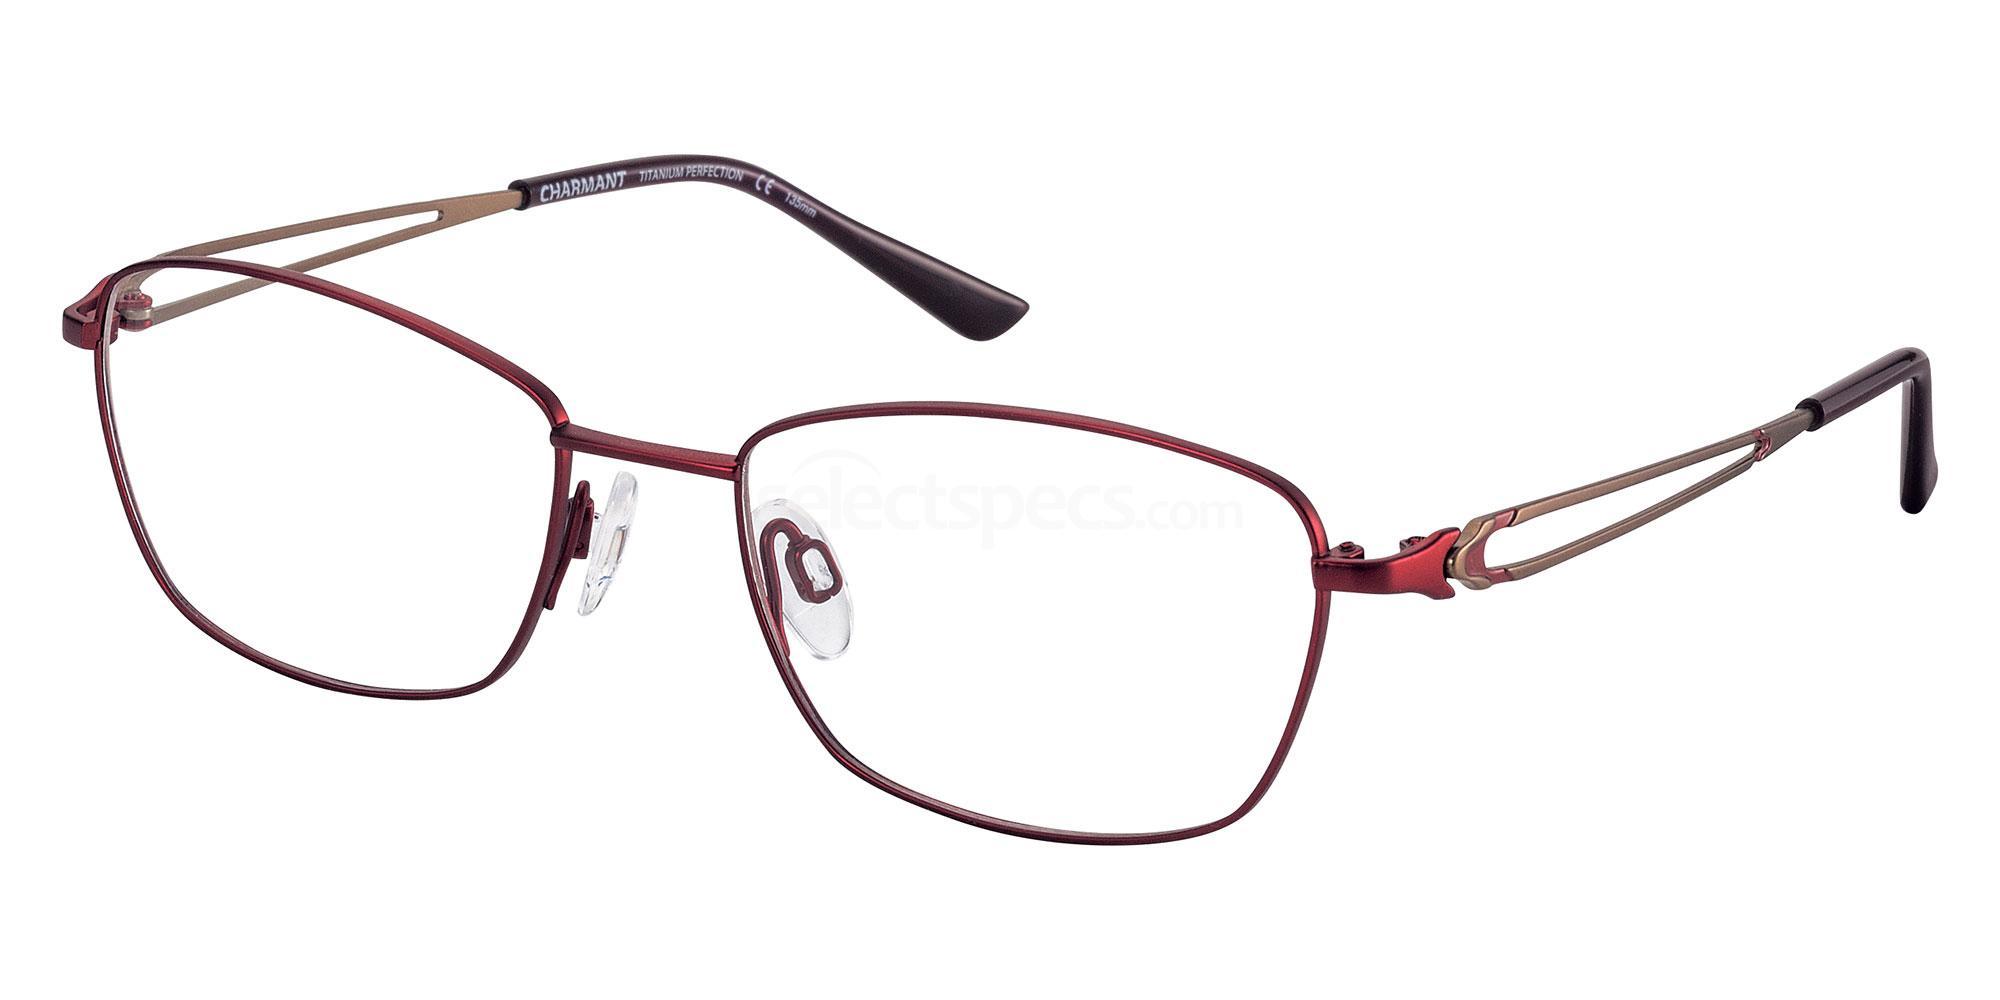 RE CH12147 Glasses, Charmant Titanium Perfection